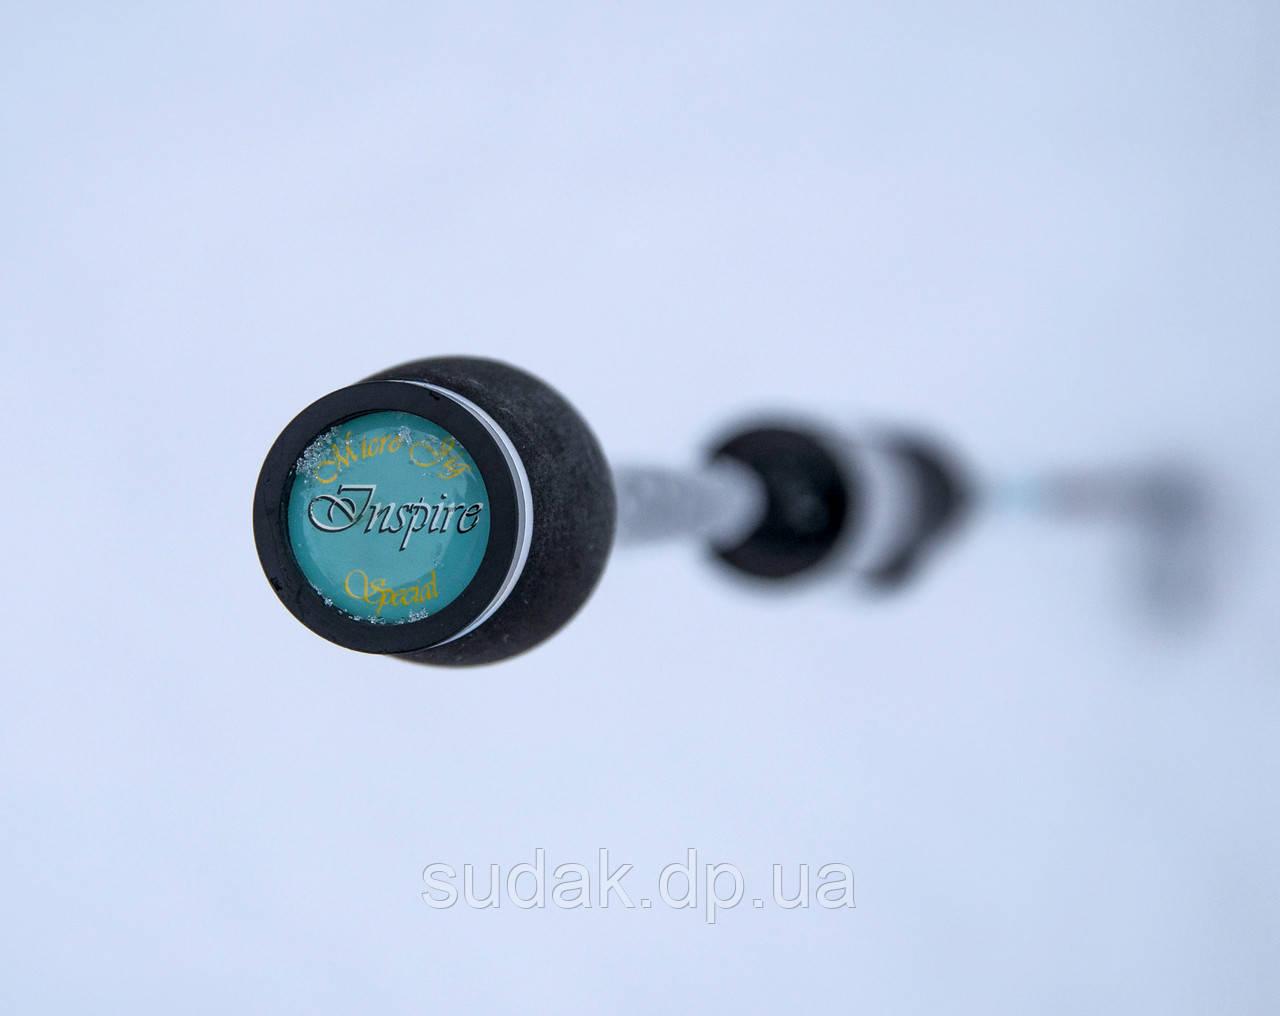 Спиннинг INSPIRE I-762 UL-S 1-6g 230 см 2-4lb